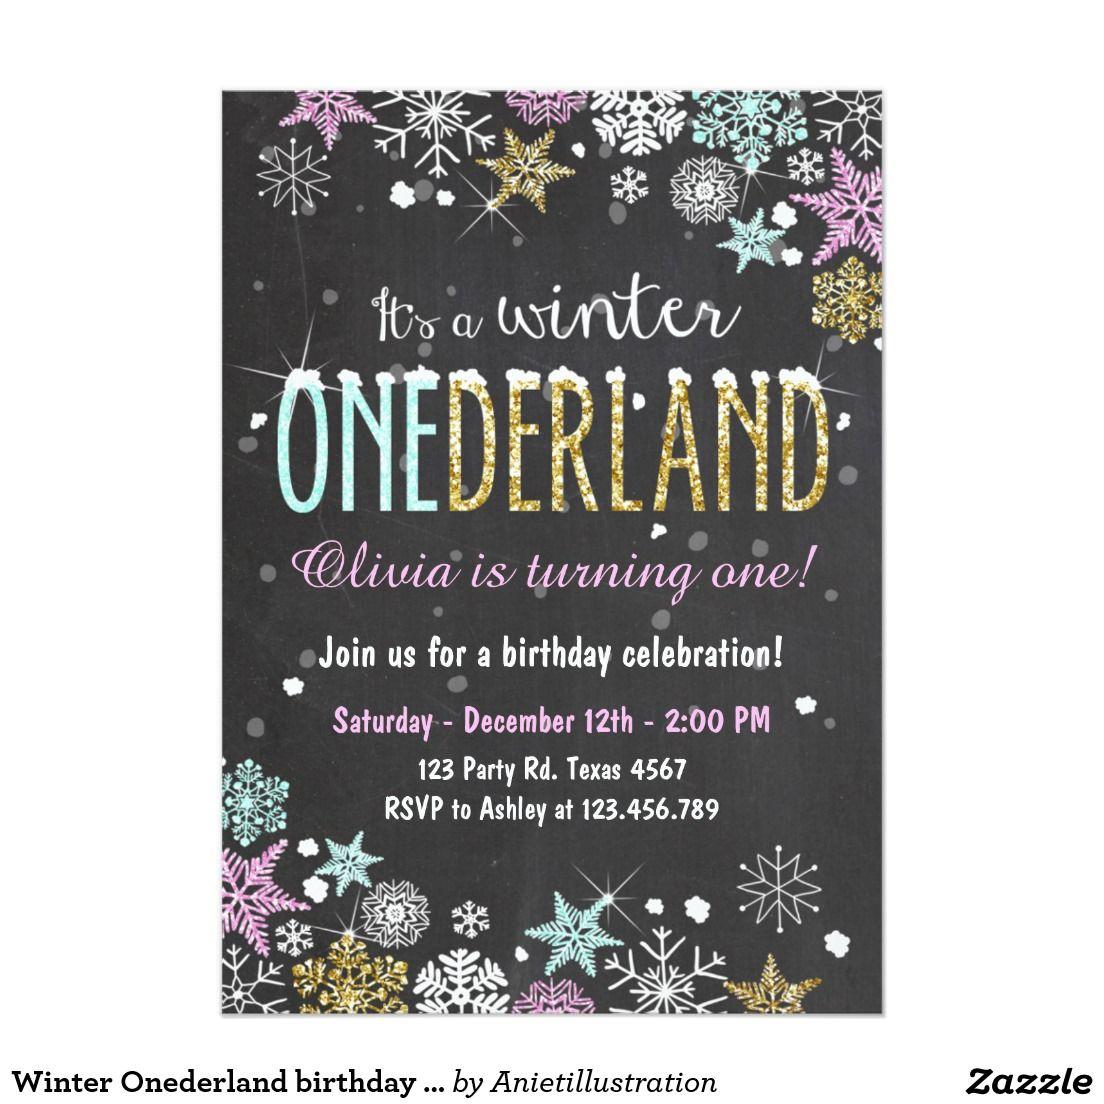 Winter Onederland birthday party invite Girl | GIRLS\' BIRTHDAY PARTY ...